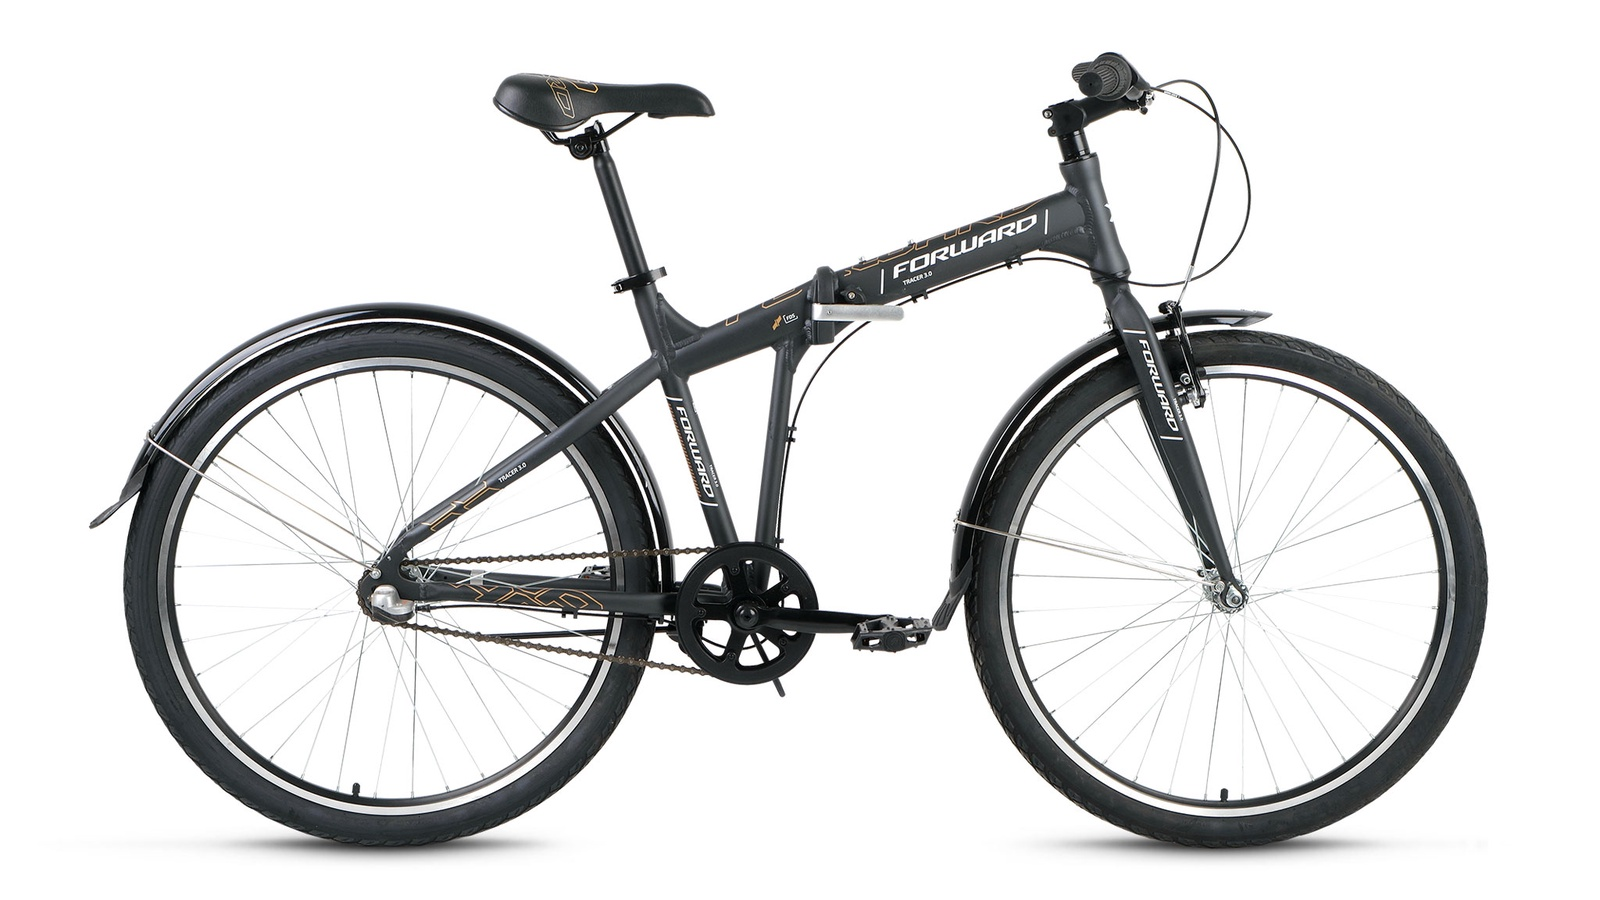 Велосипед Forward Tracer 26 3.0, серый велосипед forward tracer 3 0 рама 17 белый